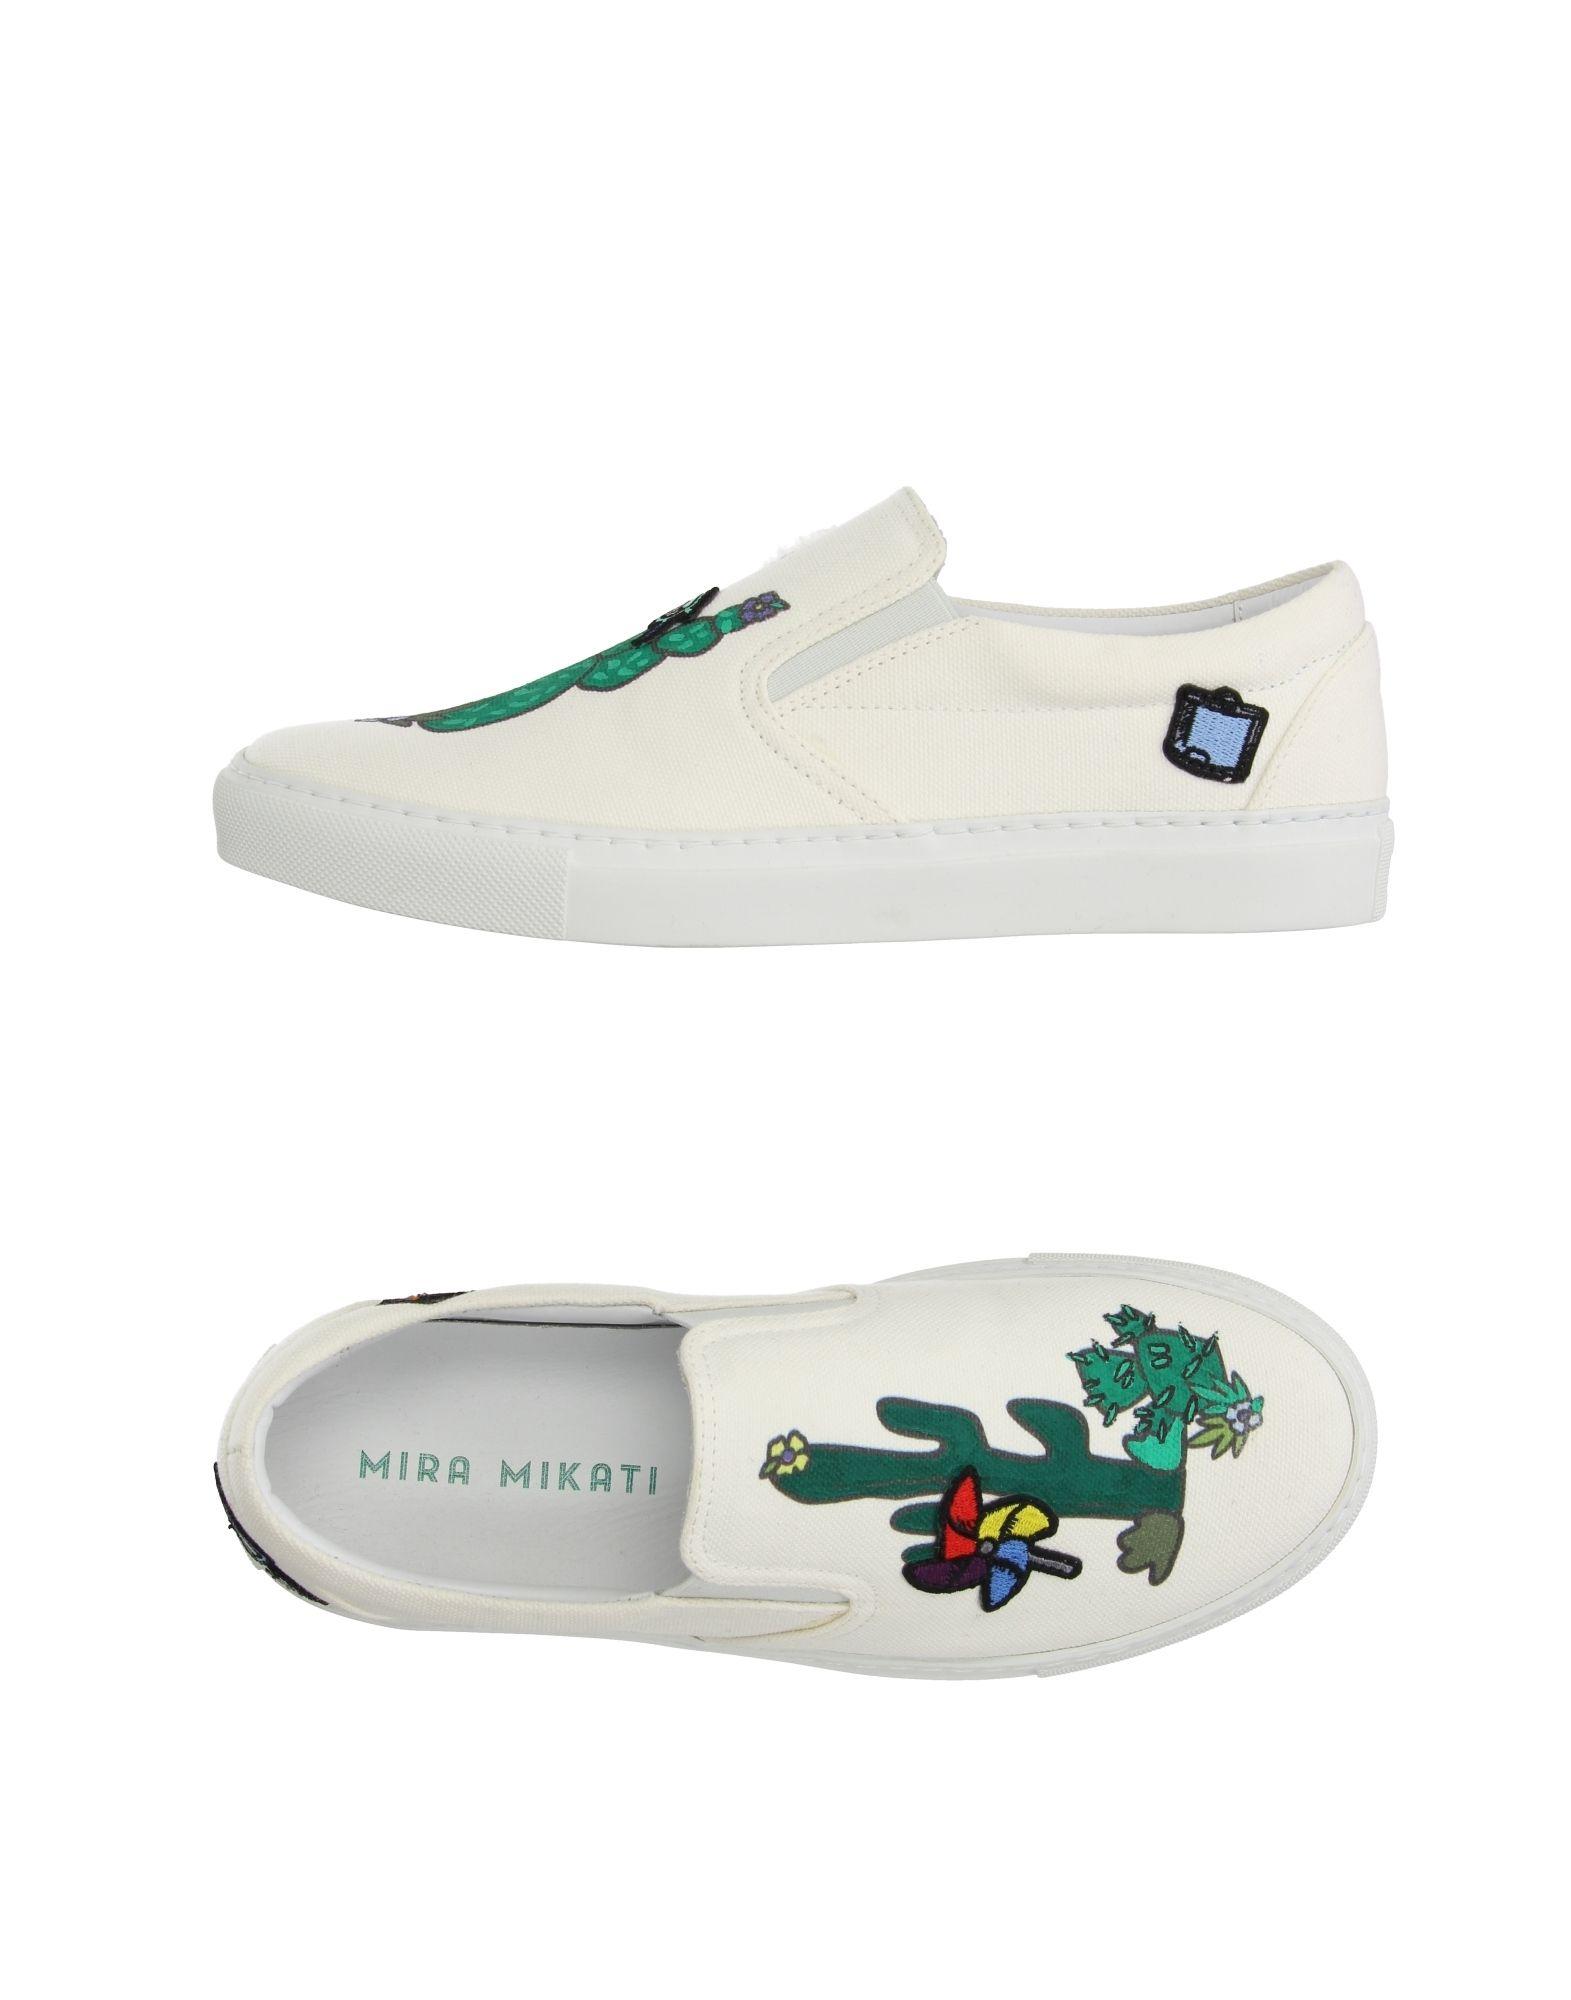 Sneakers Mira Mikati Femme - Sneakers Mira Mikati sur